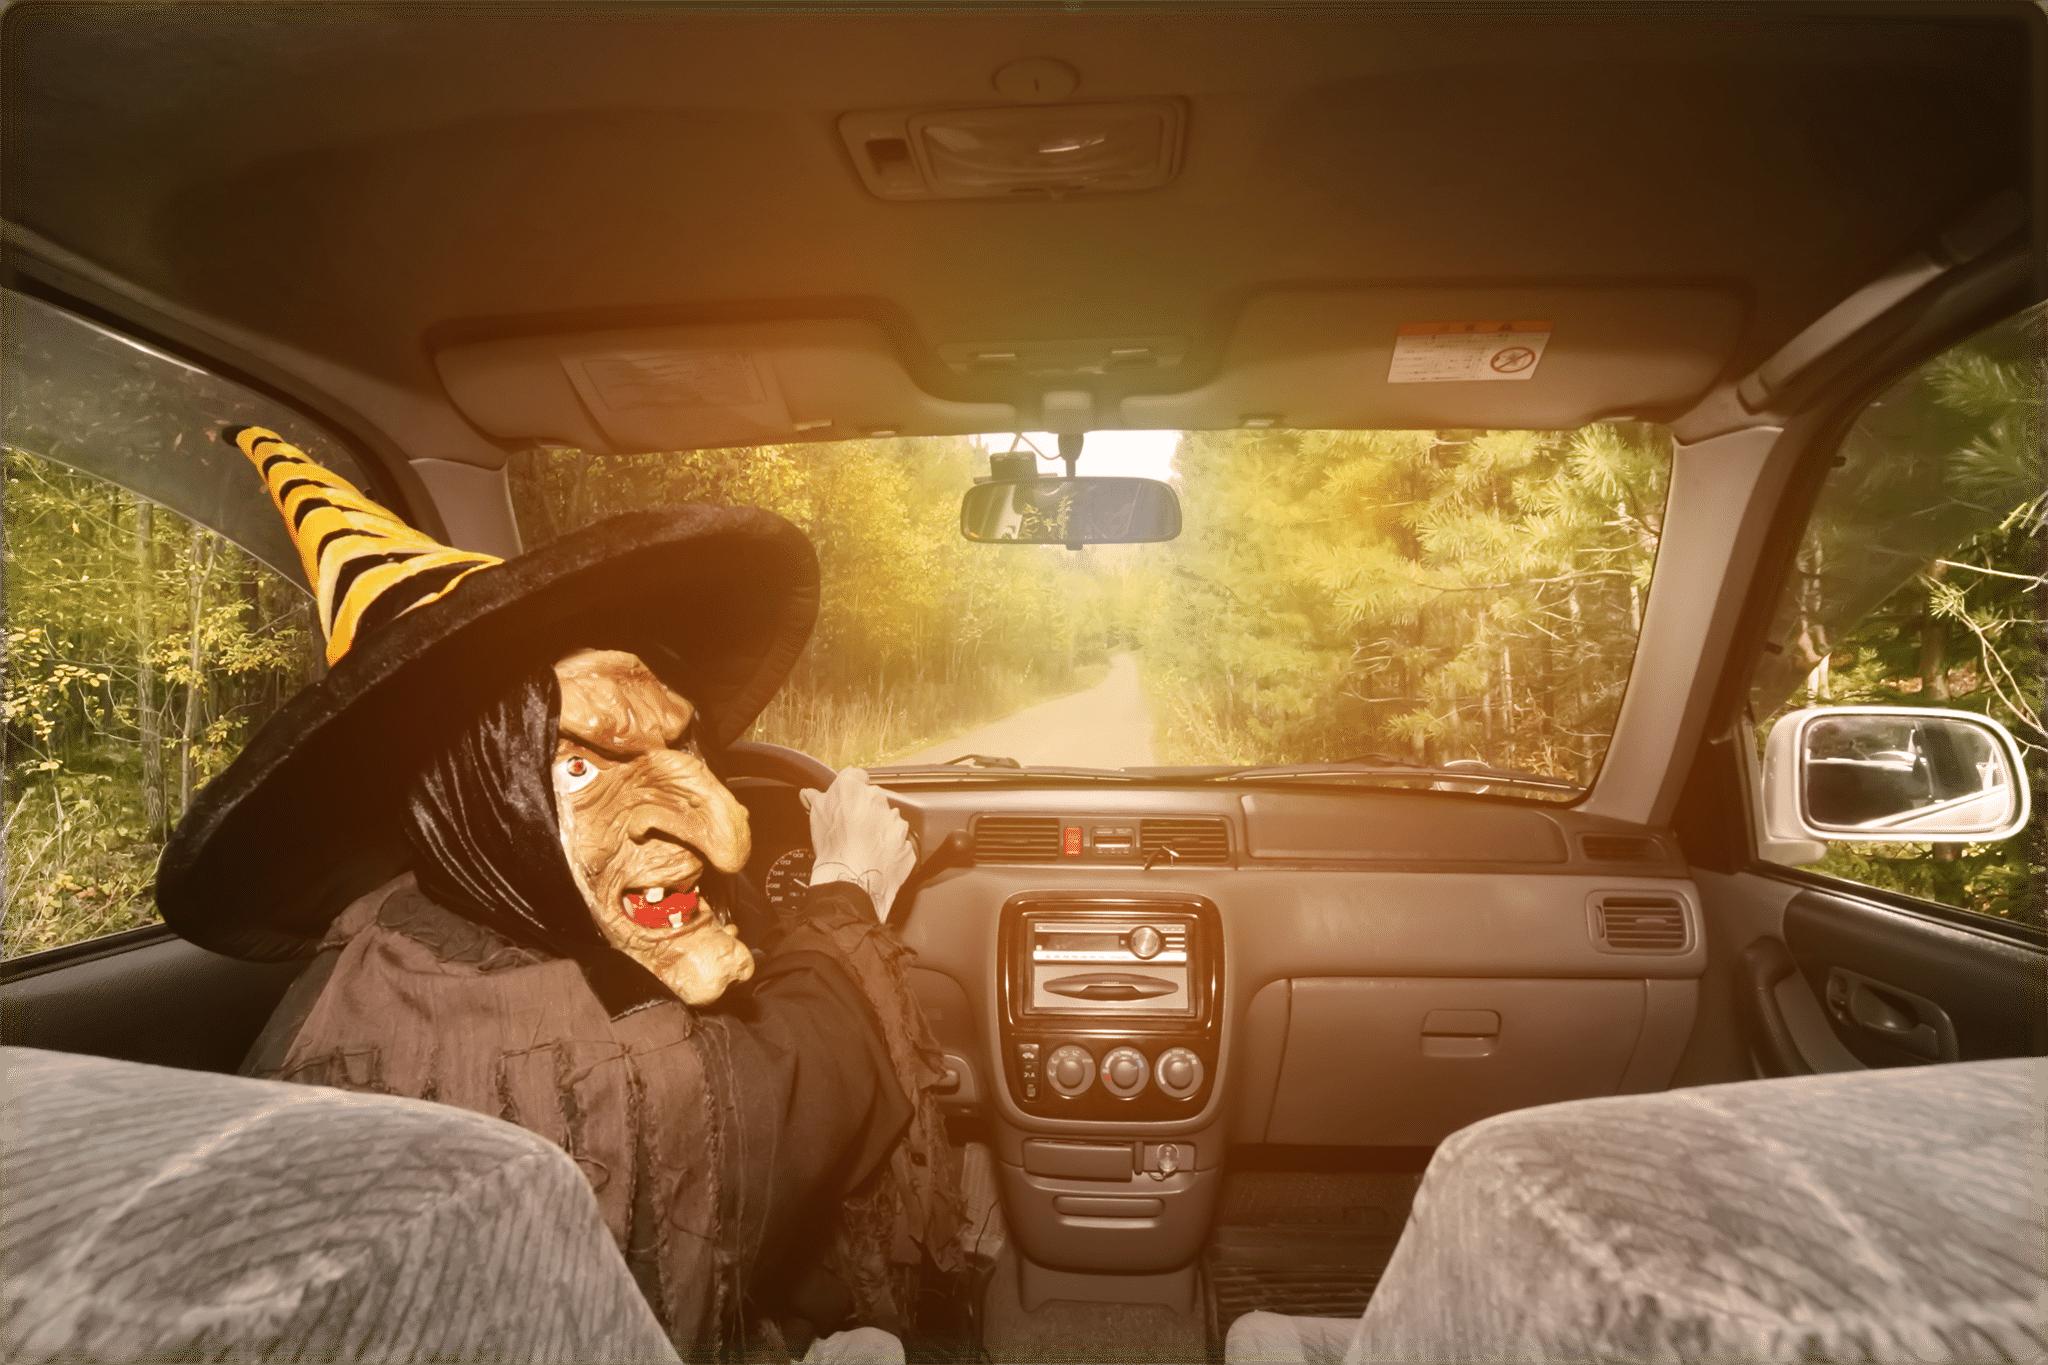 Staxi Halloween Taxichauffeur